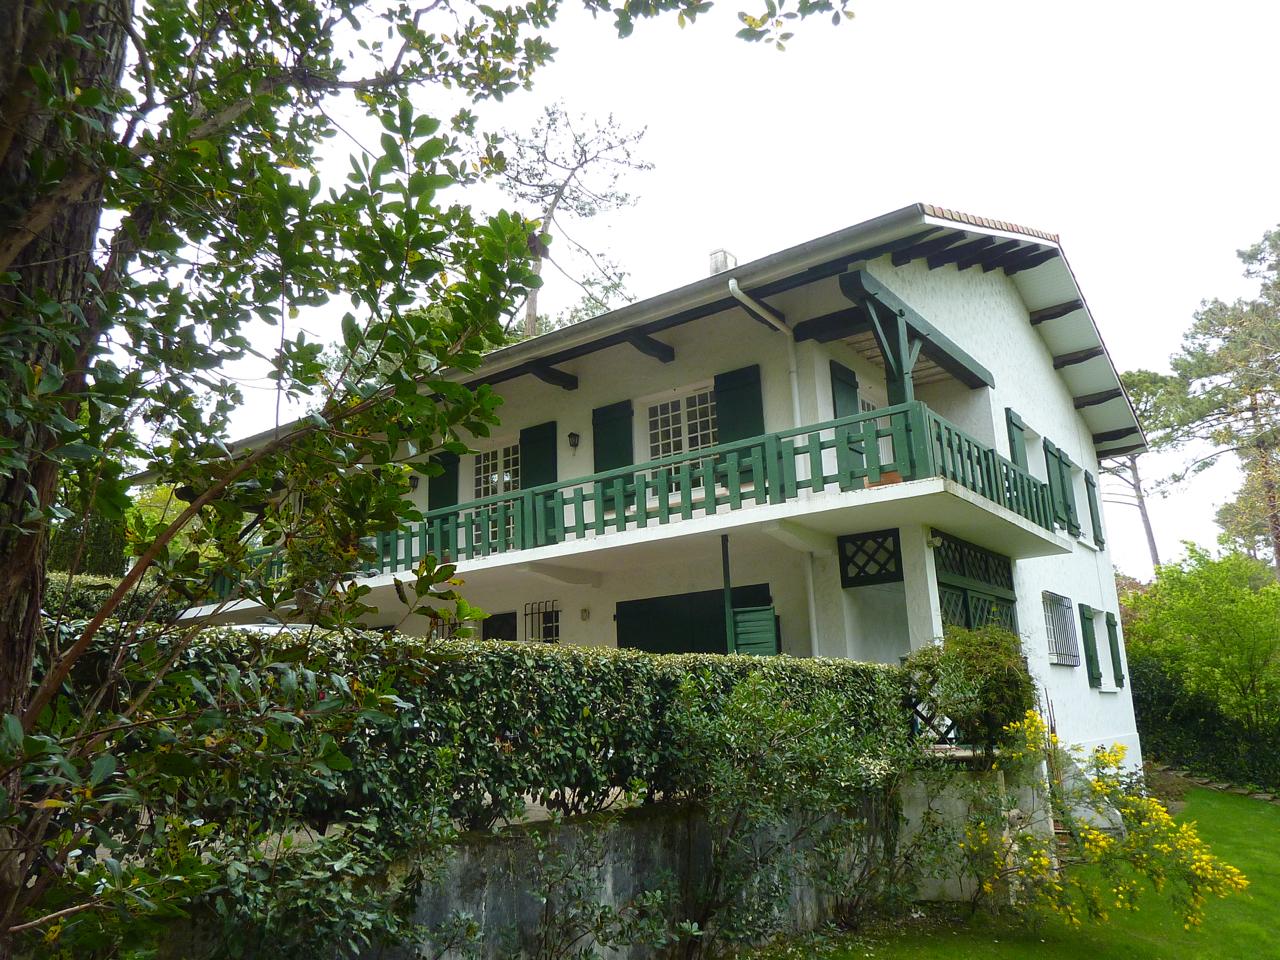 Vendu pyla sur mer grande villa traditionnelle avec vue for Villa traditionnelle